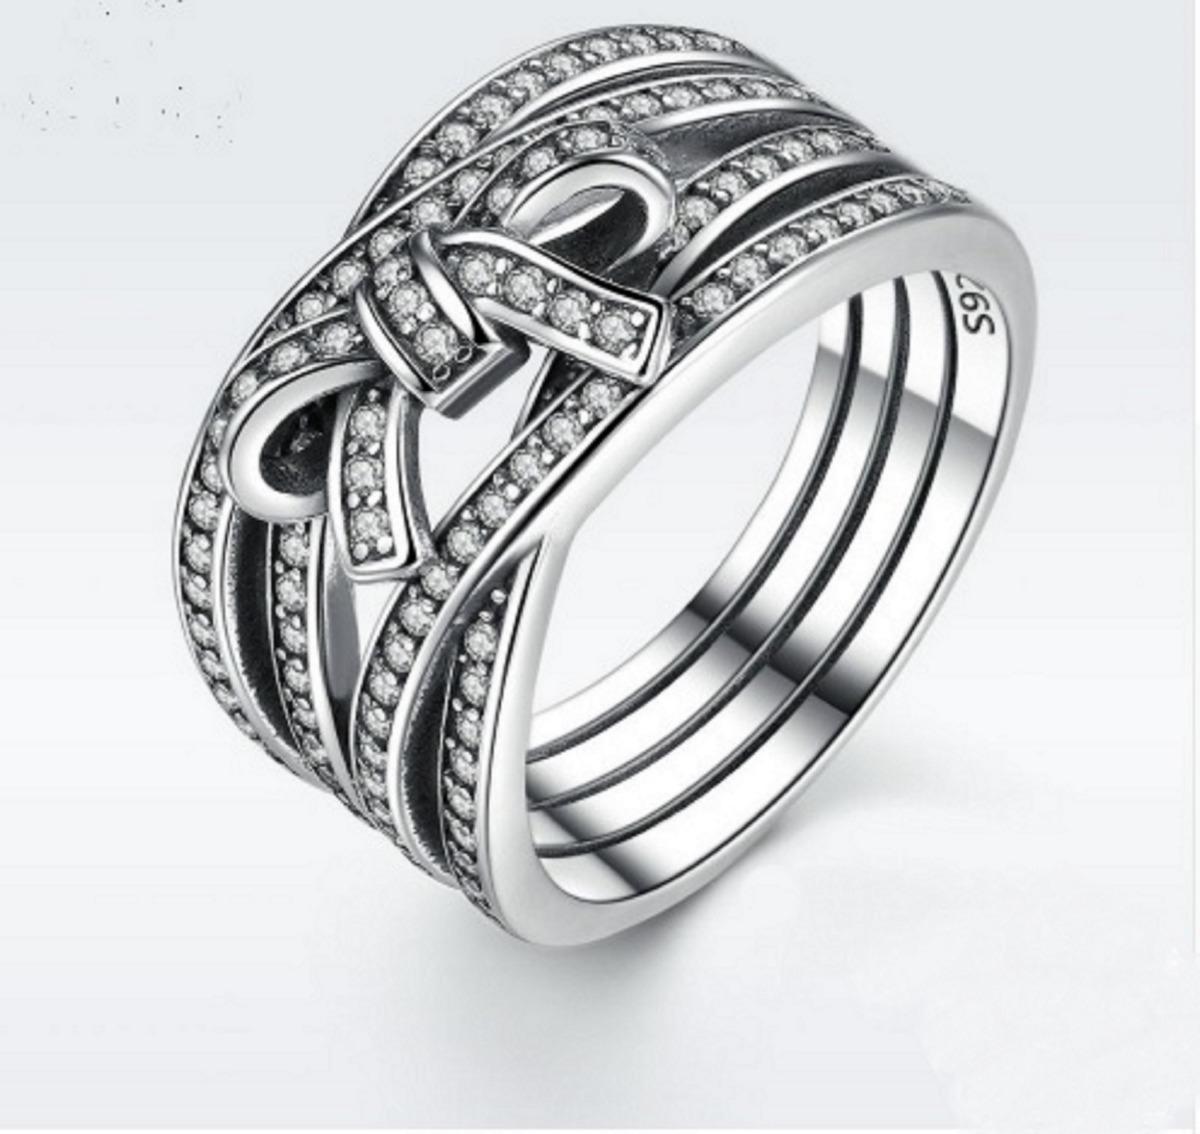 be718b923ce70 anel estilo pandora prata 925 modelo delicados sentimentos. Carregando zoom.